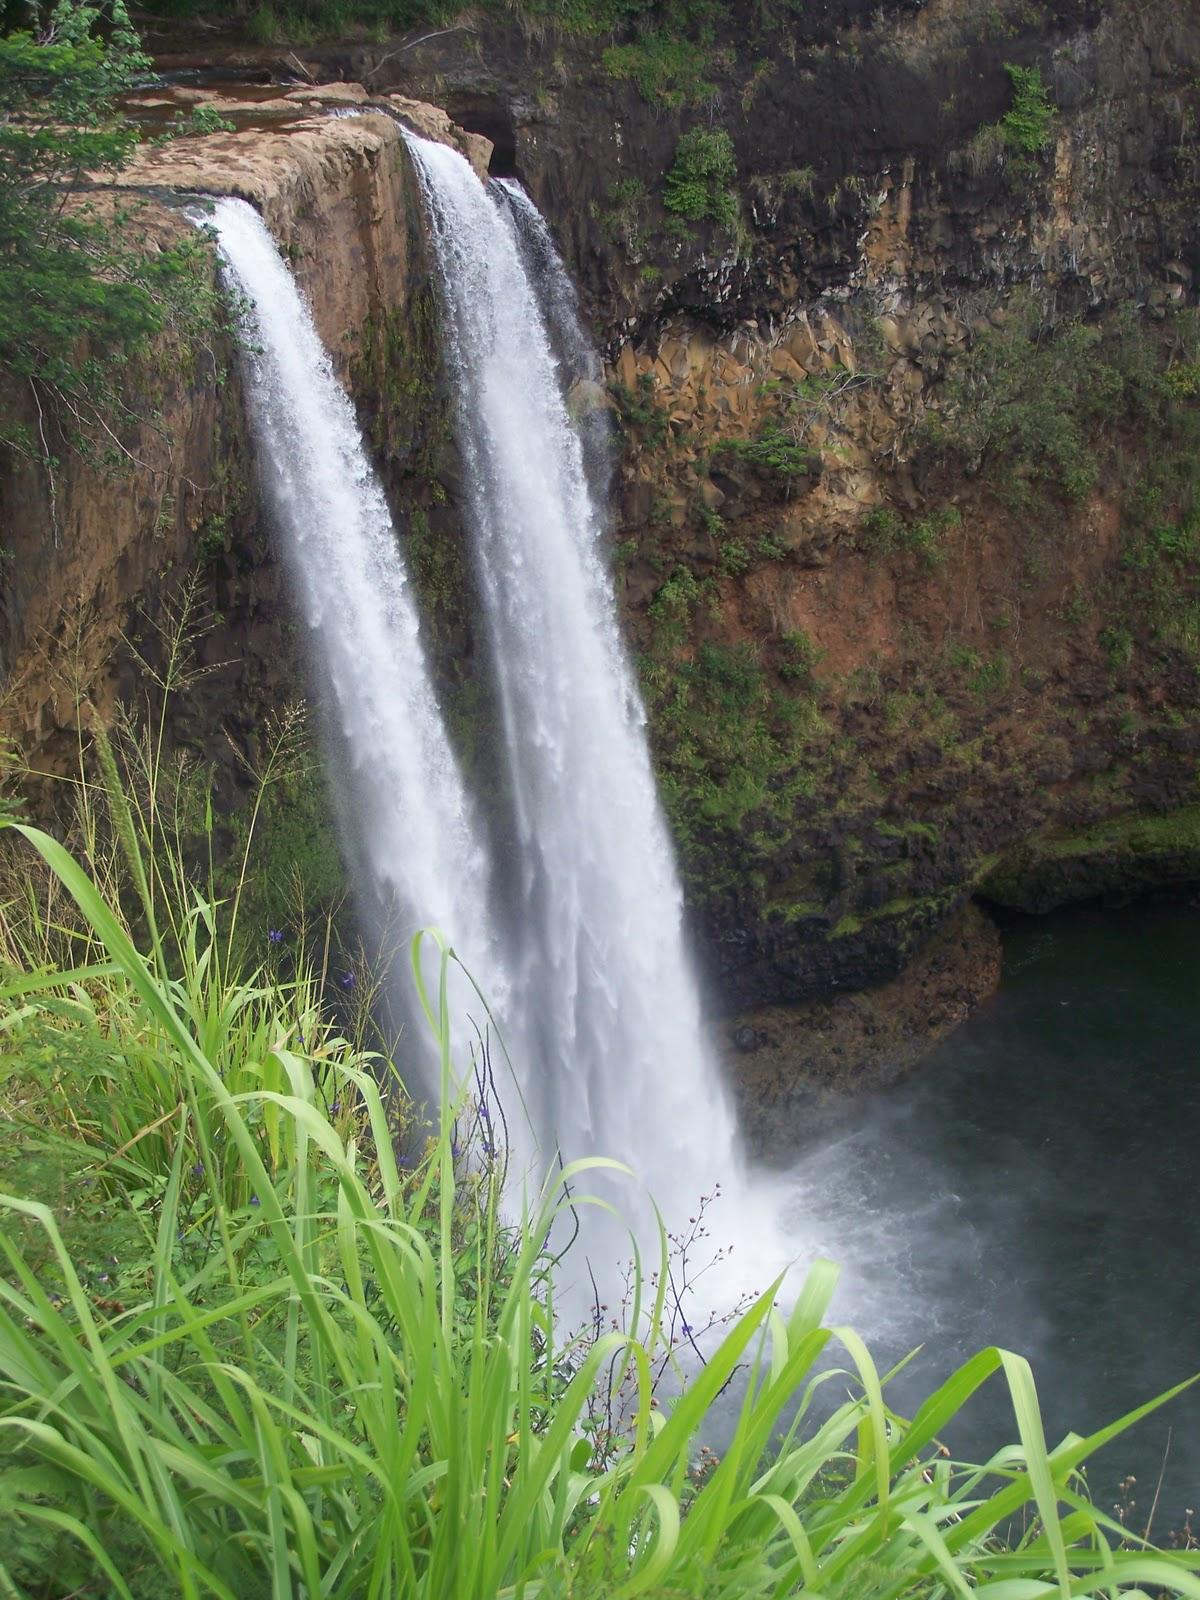 kauai gay scene